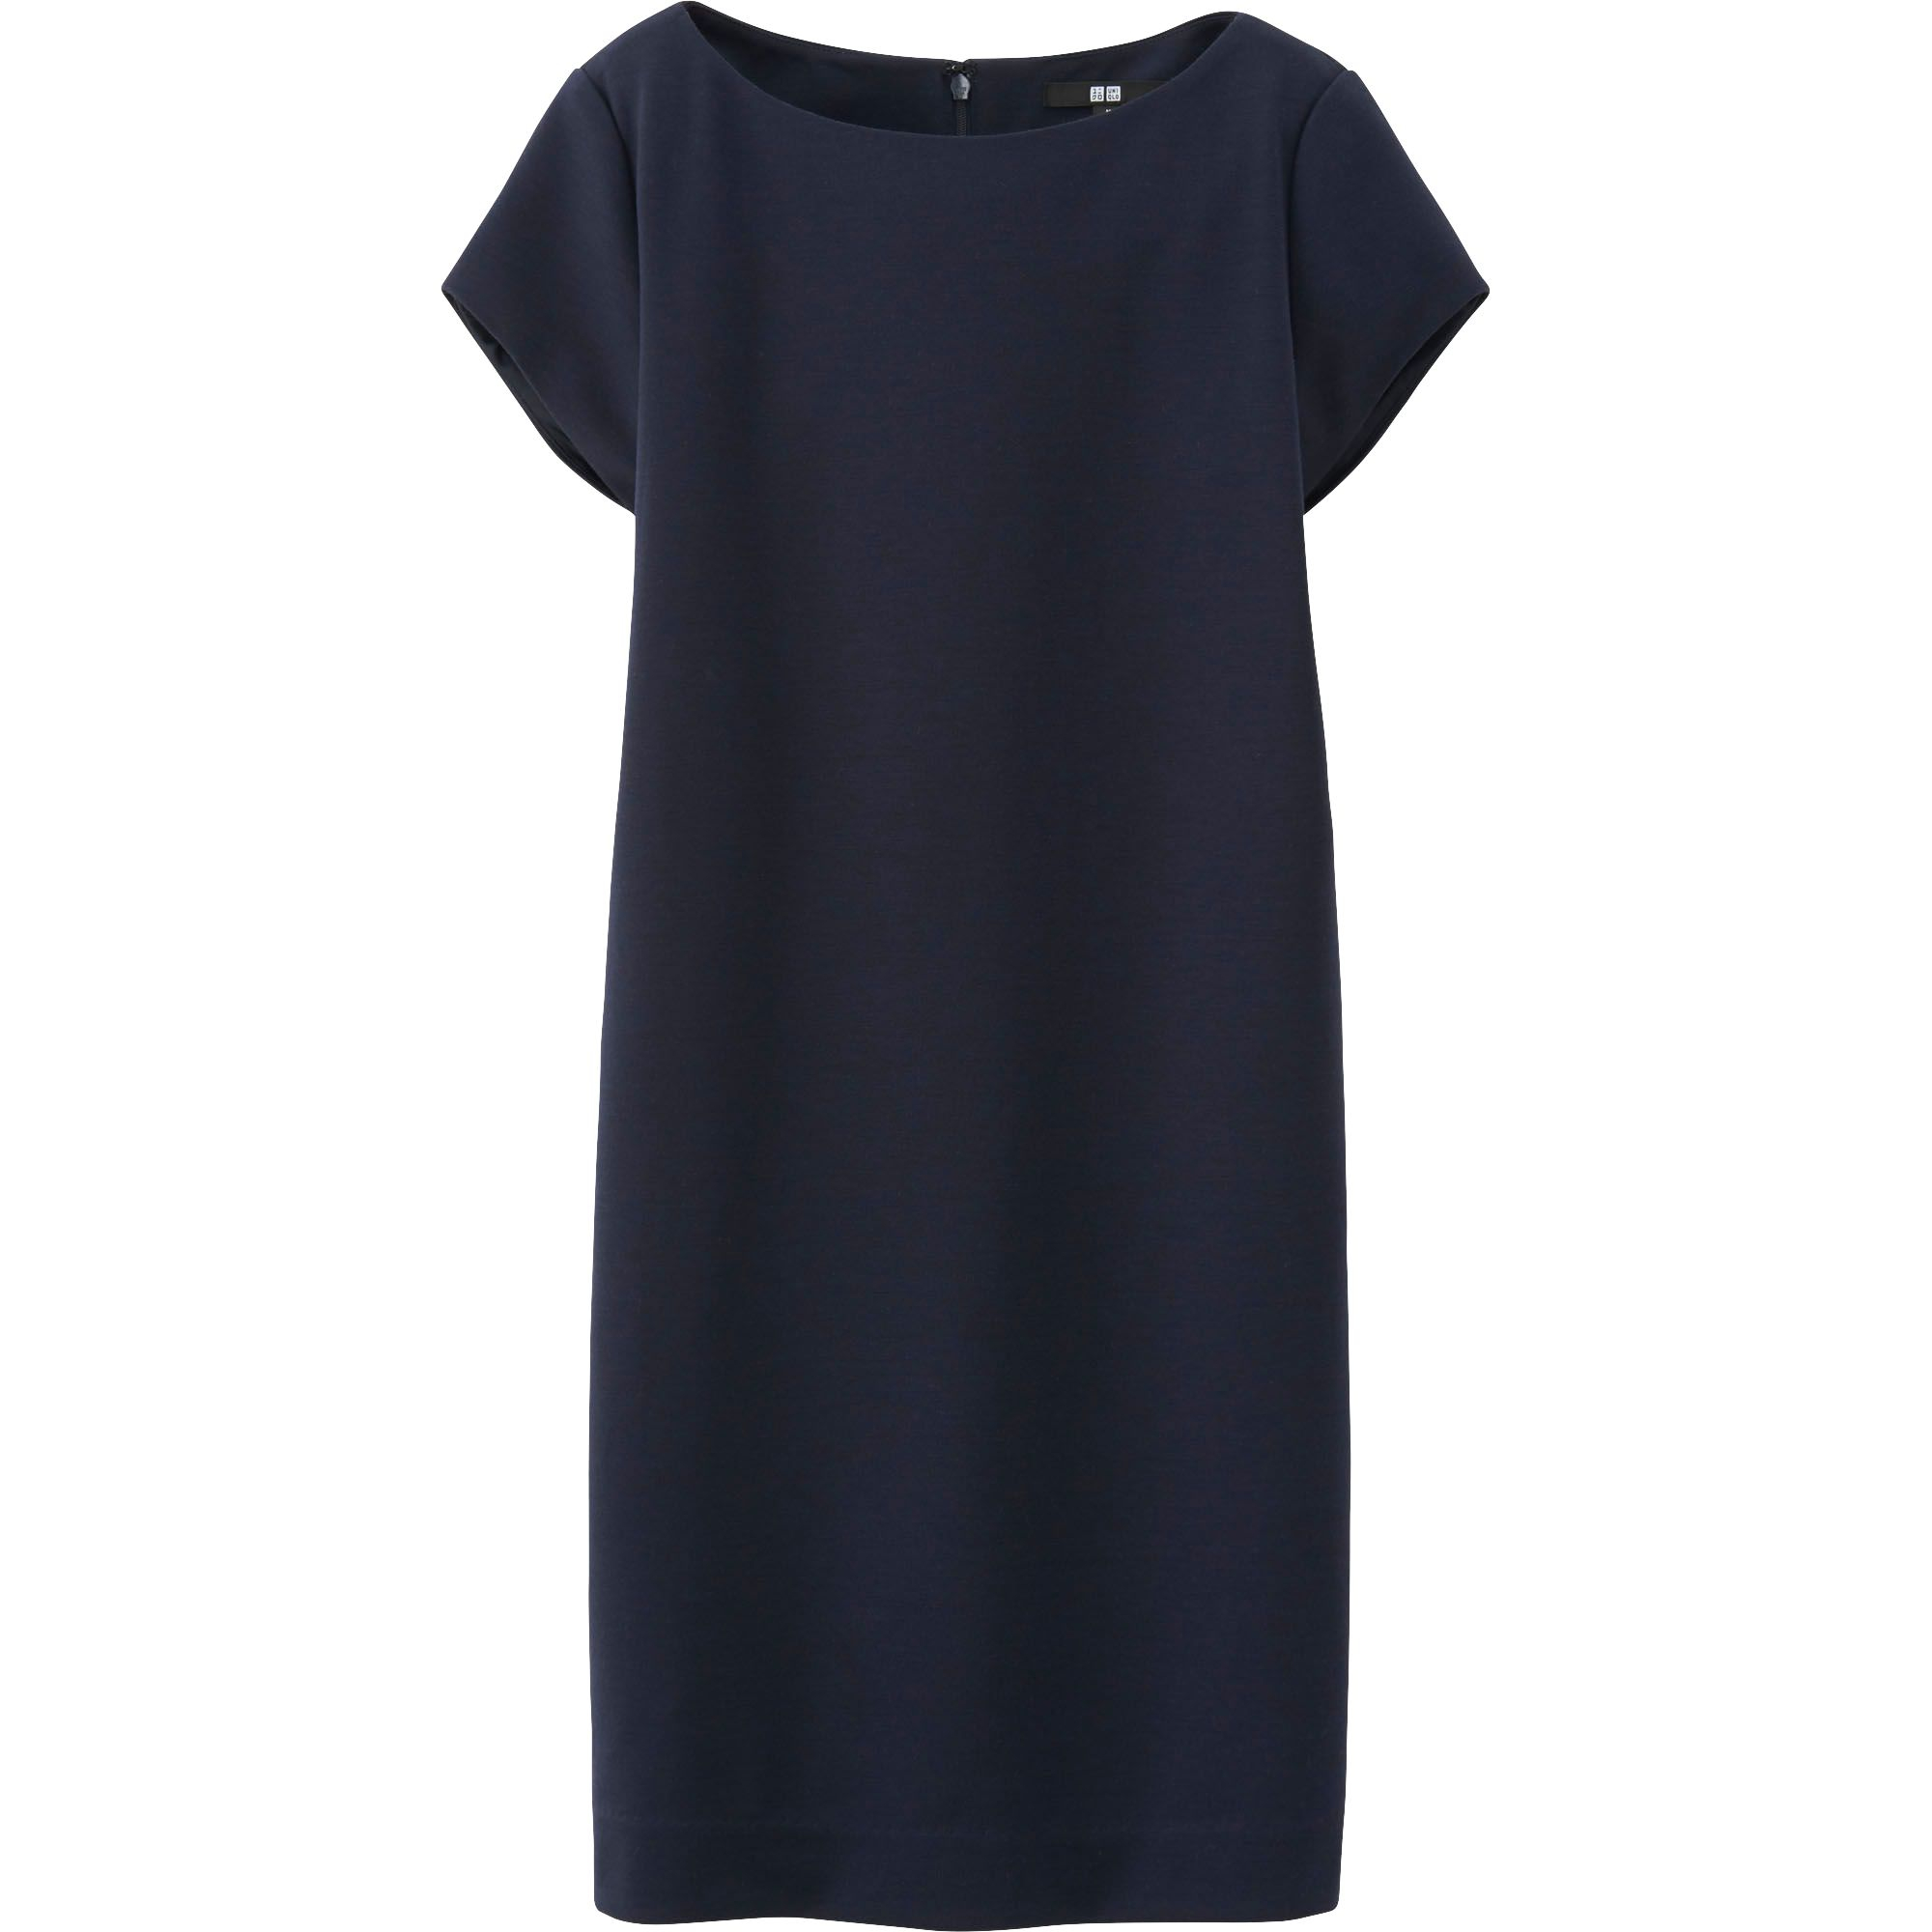 Cool Dress Uniqlo Dresses Simple Clothing Sleeveless Dresses Forward Women